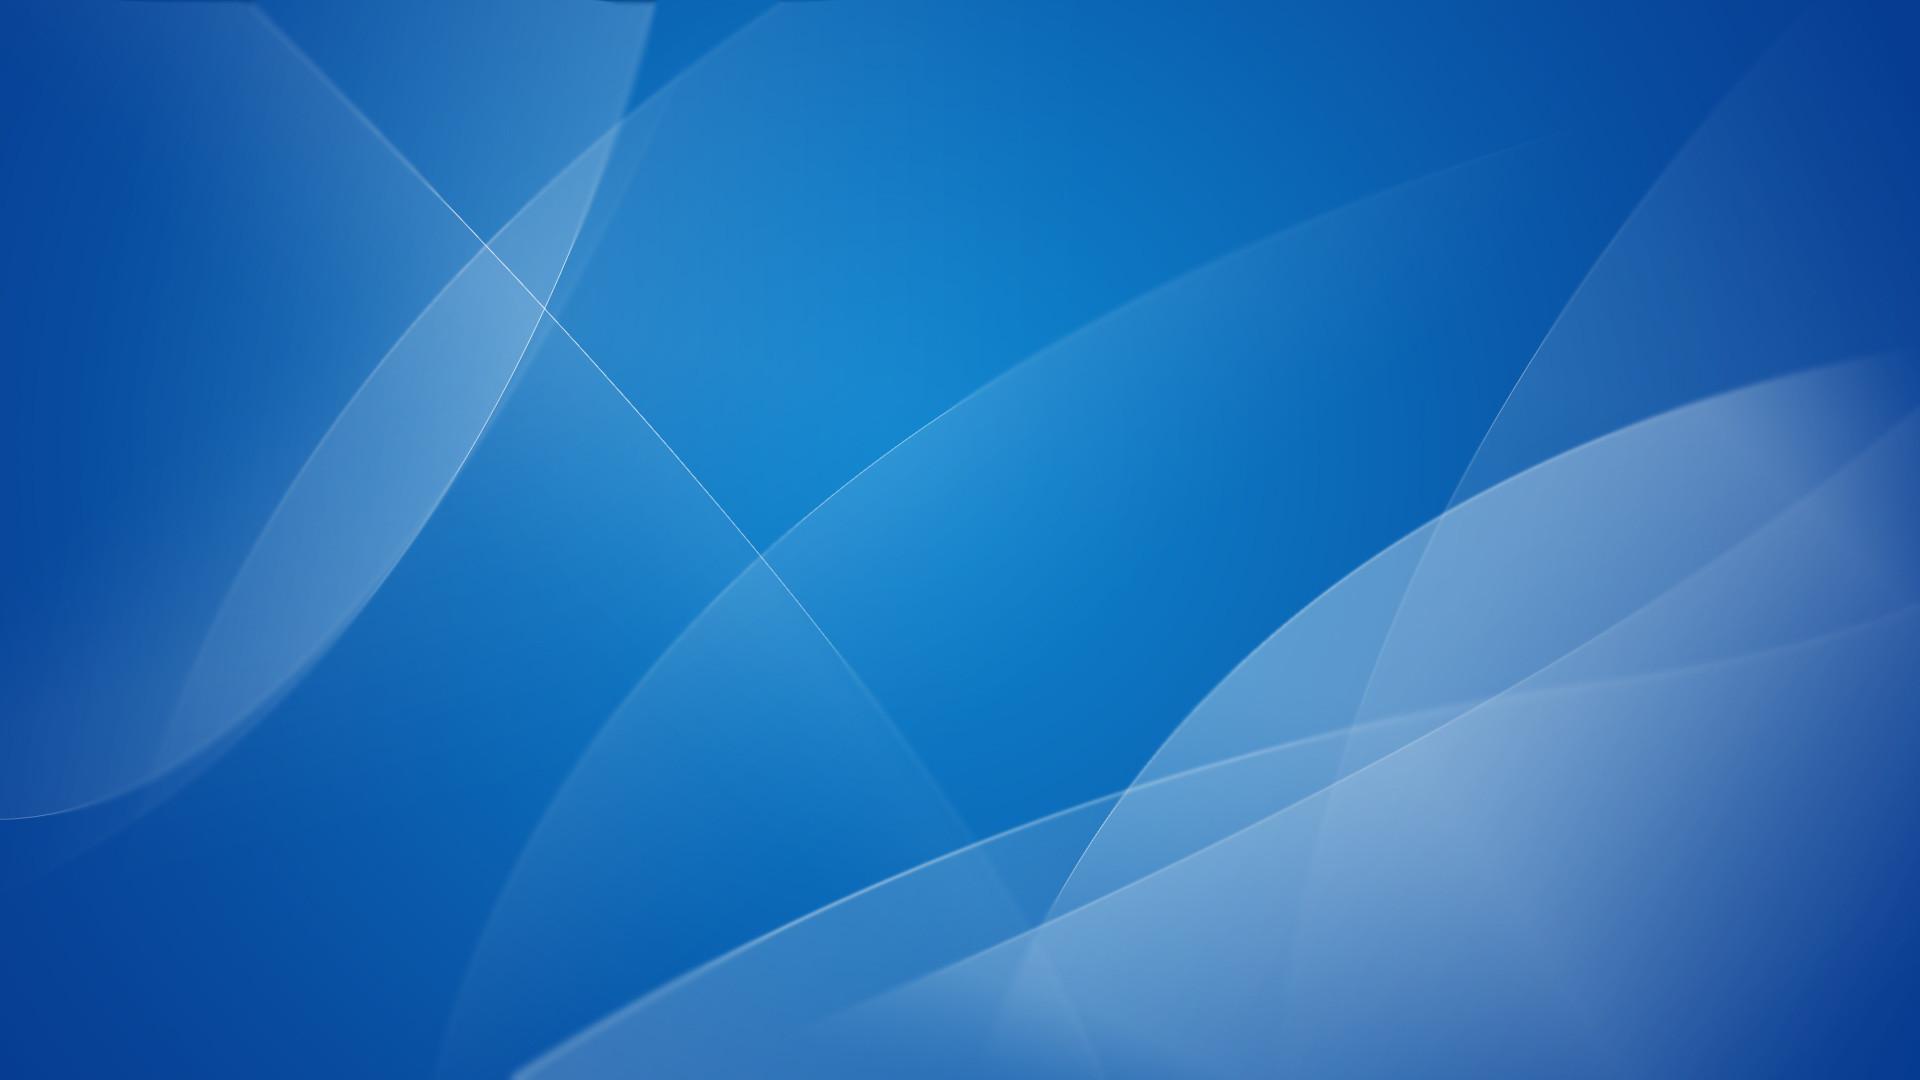 Blue Techno Wallpaper #6618 Wallpaper | Cool Walldiskpaper.com